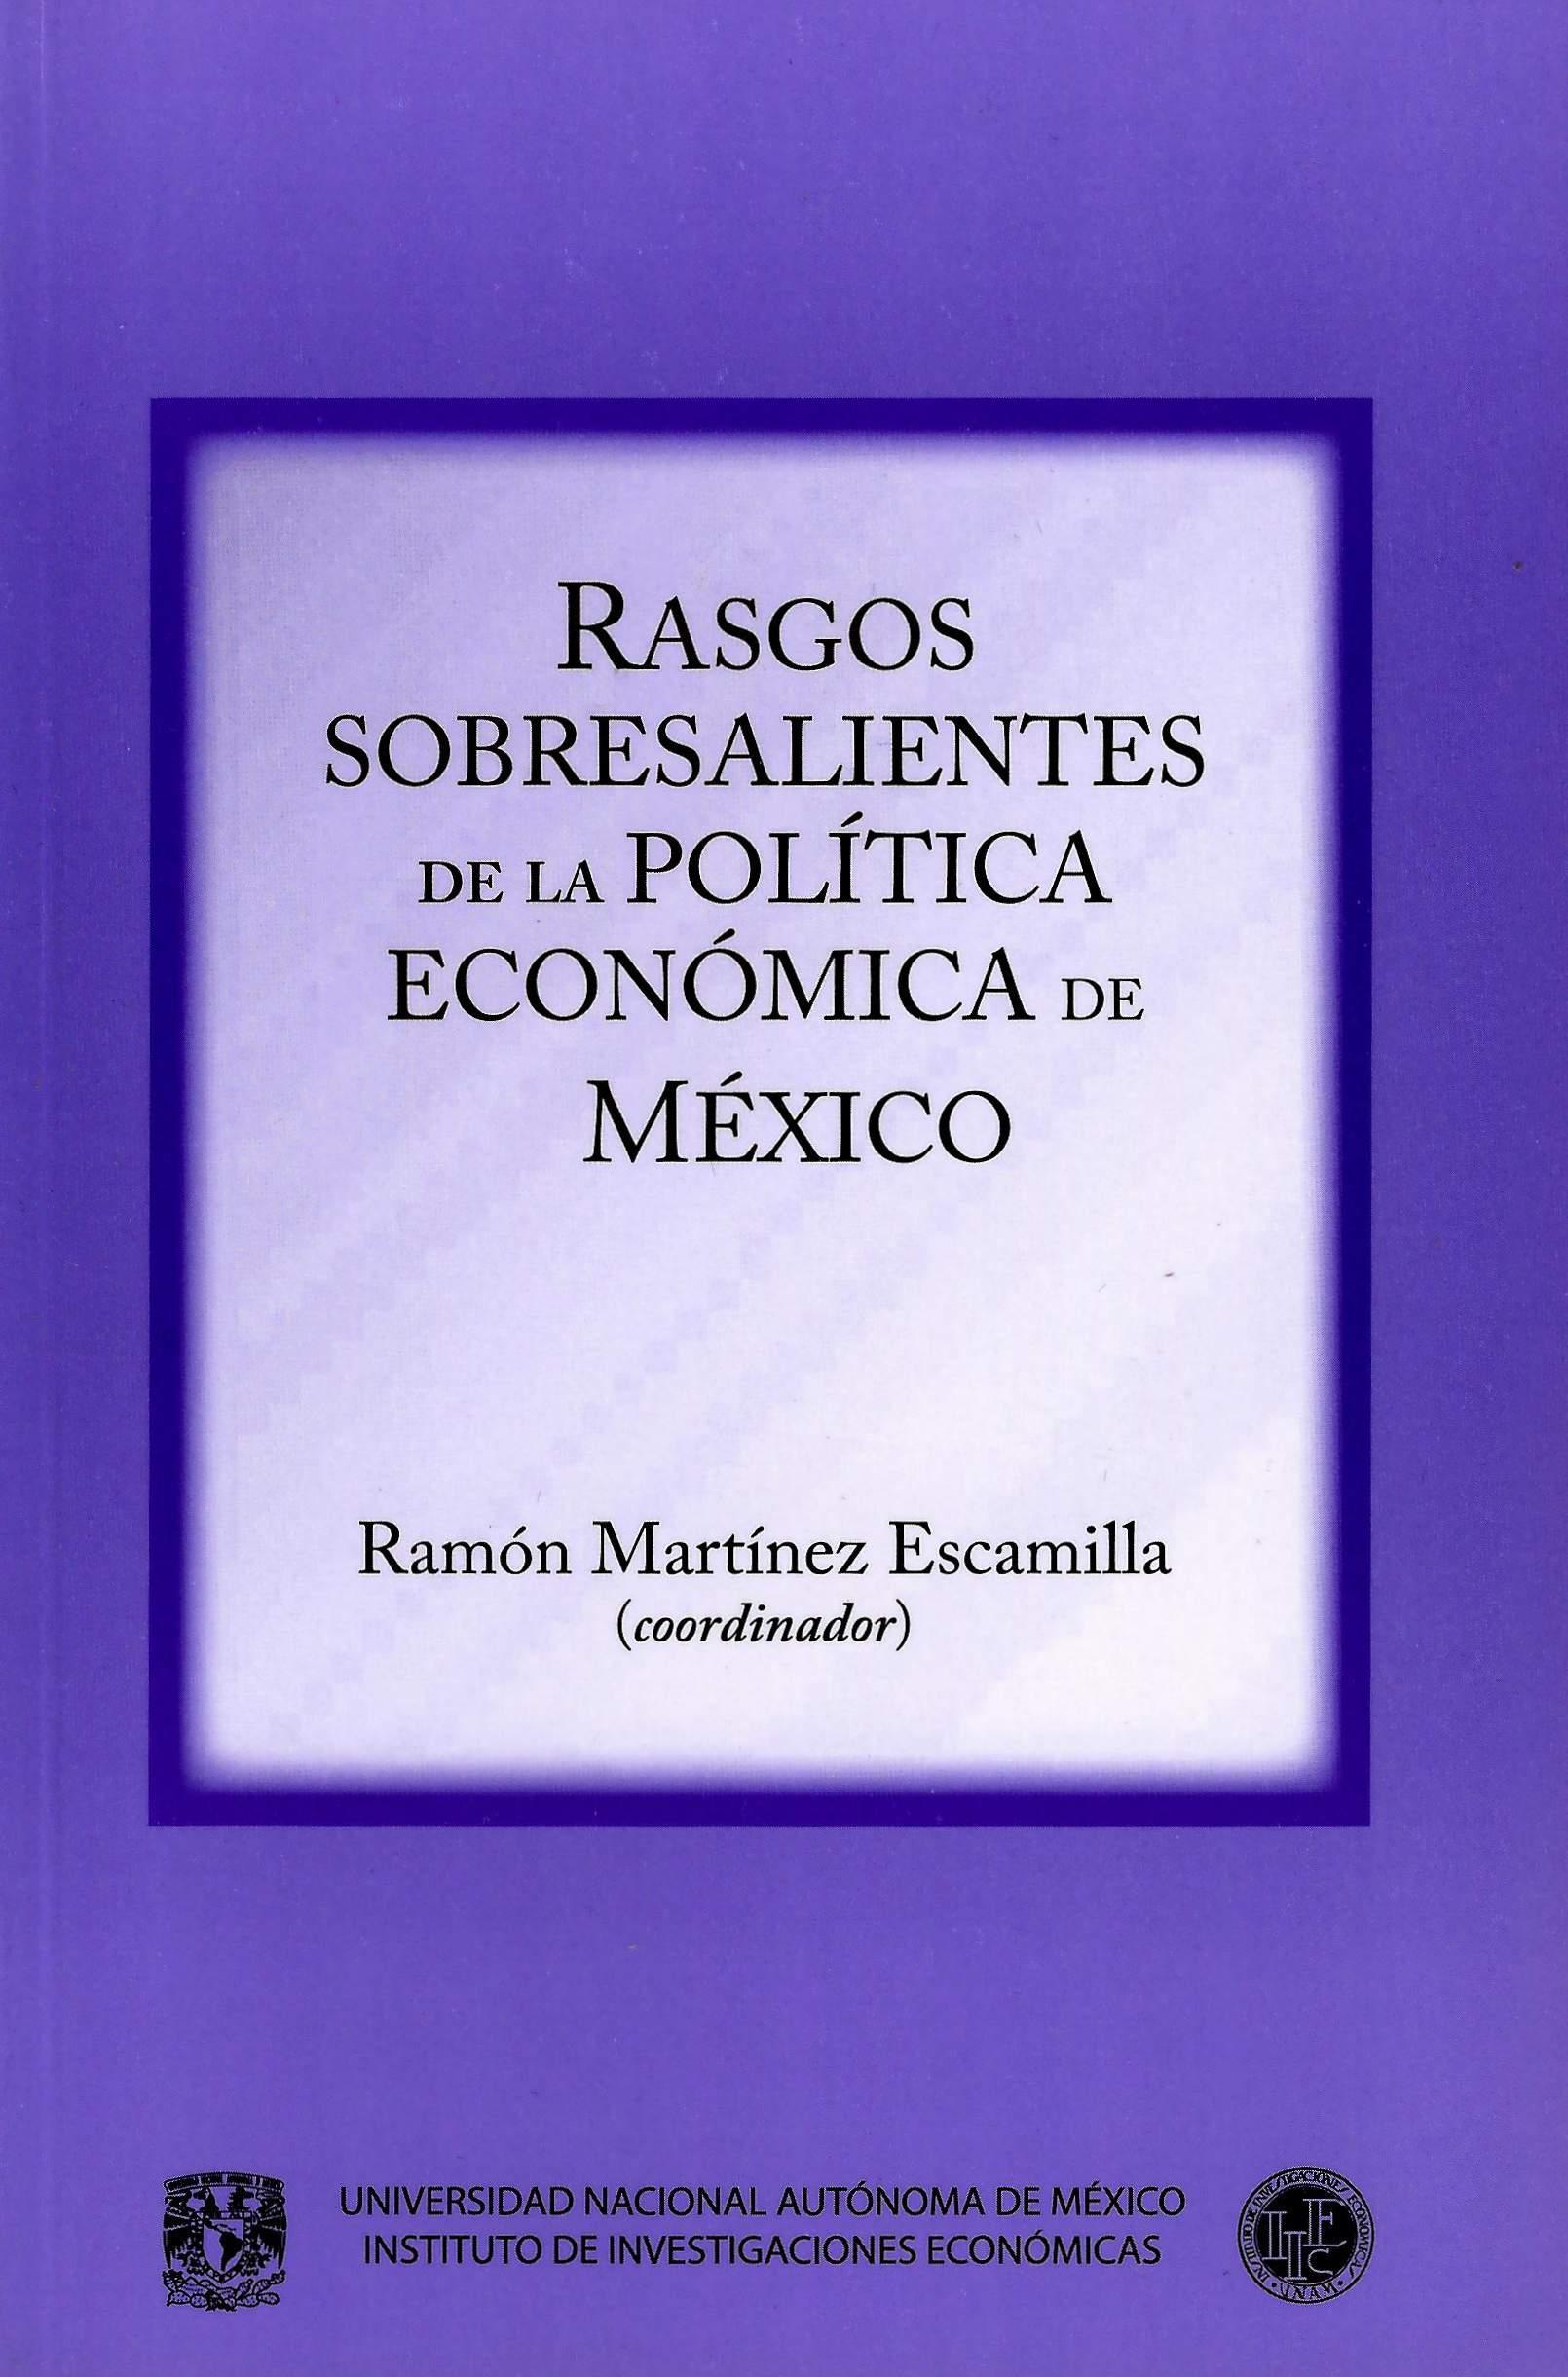 Rasgos sobresalientes de la política económica de México